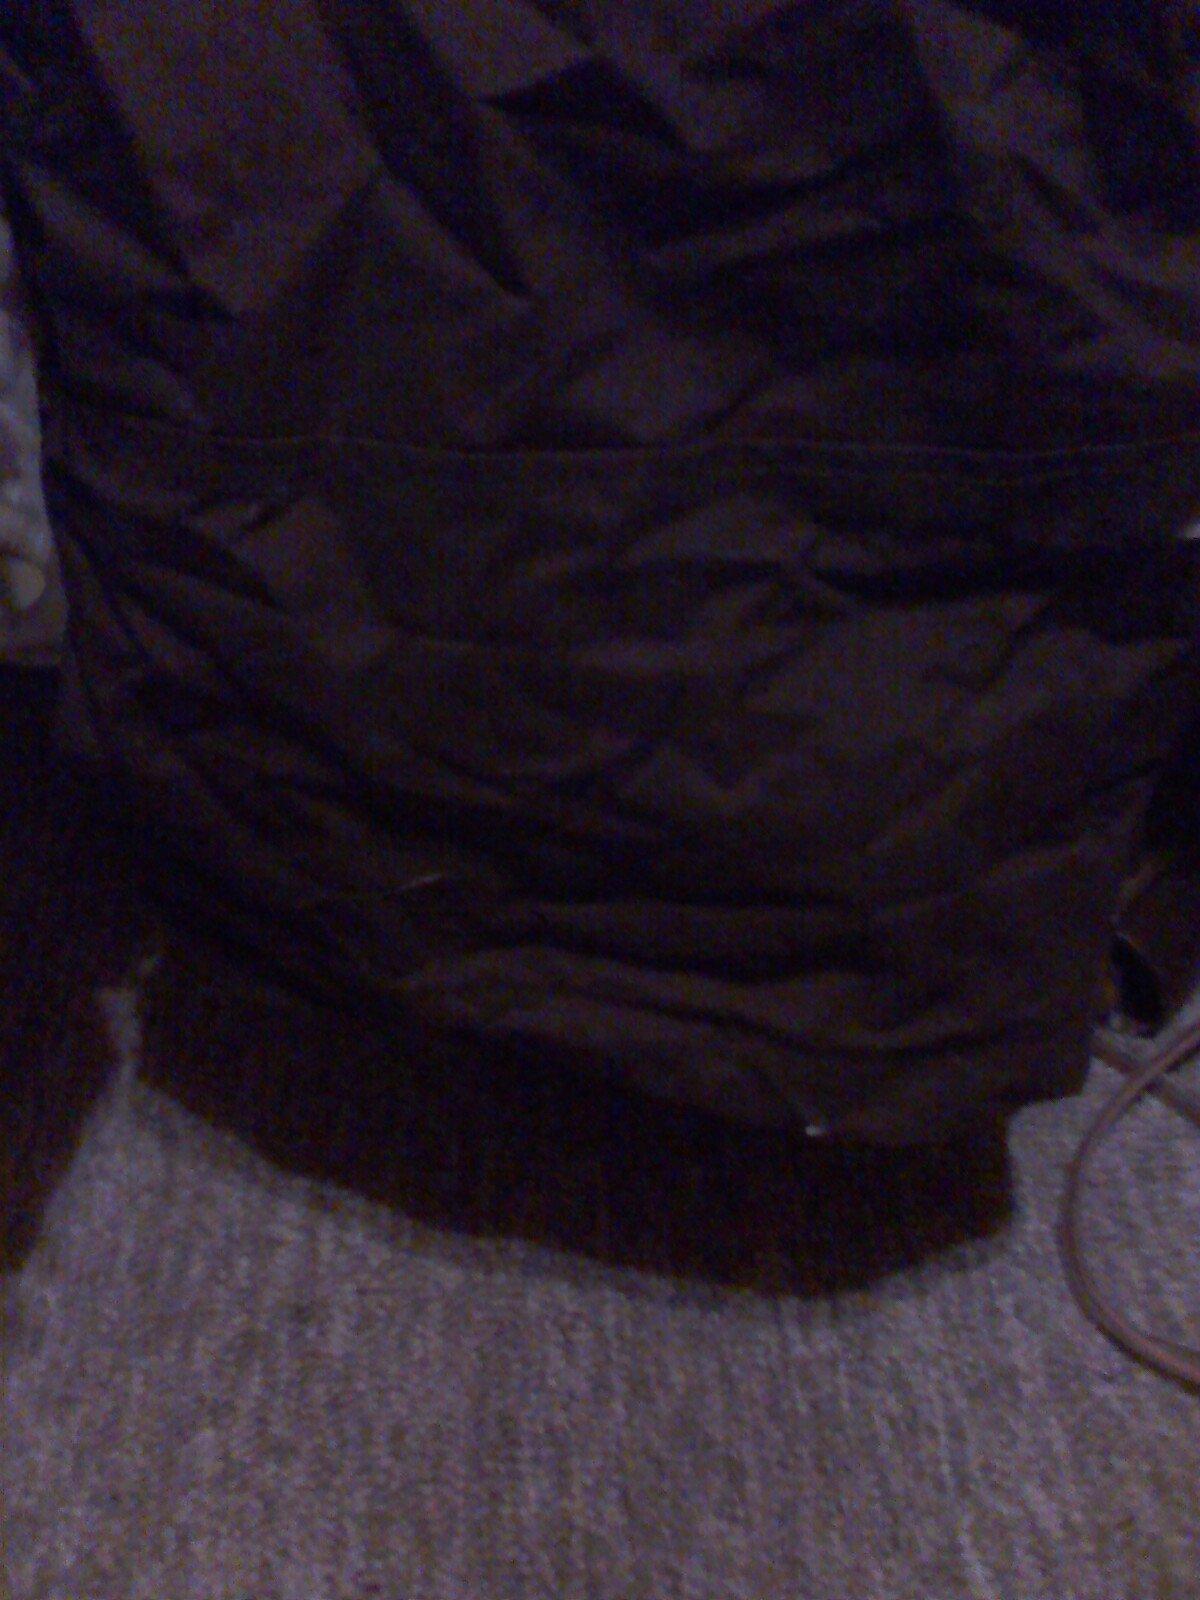 Back of pant cuff